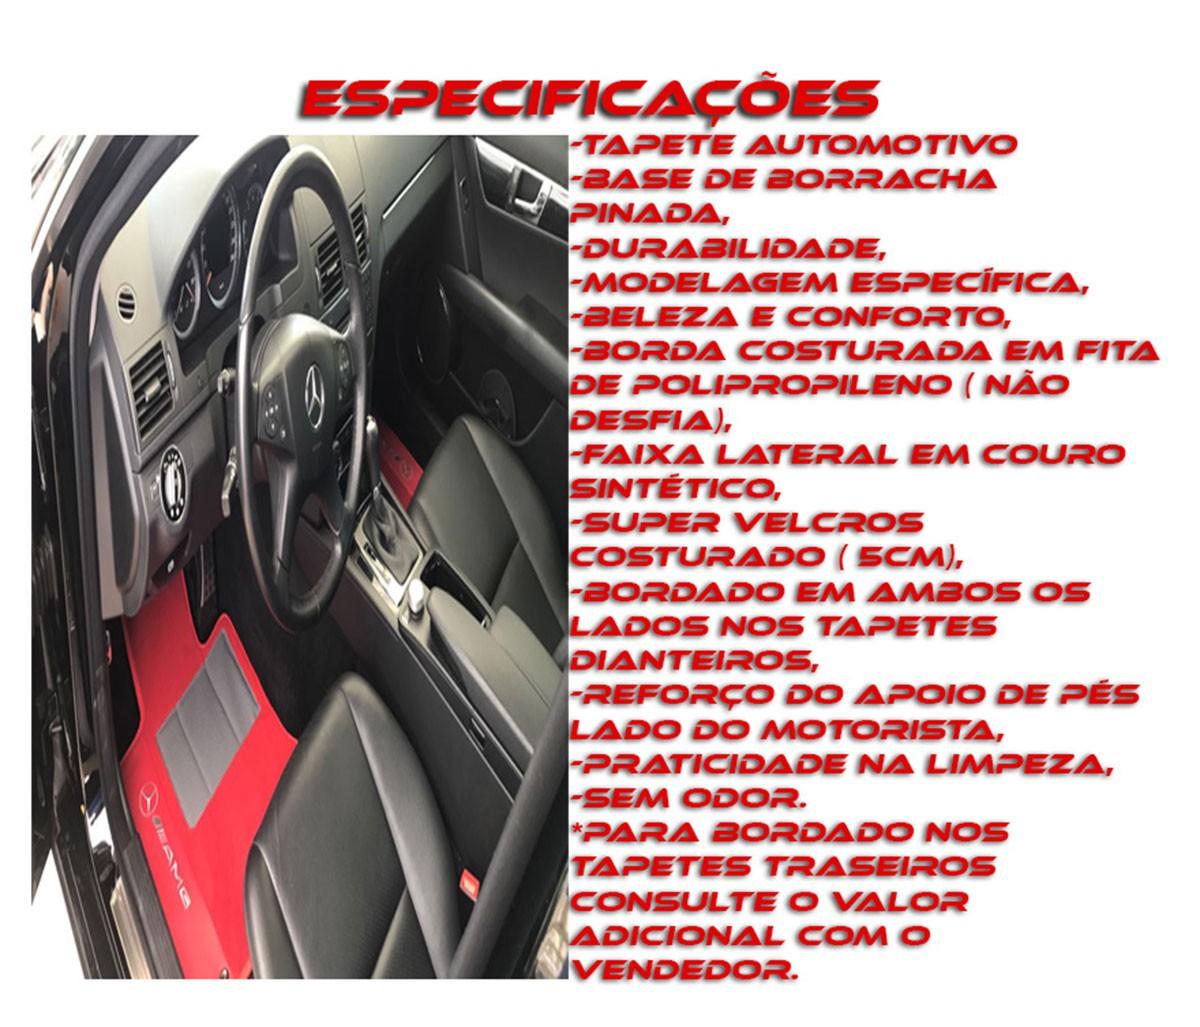 Tapete Audi Q3 Carpete Luxo Base Borracha Alto padrão